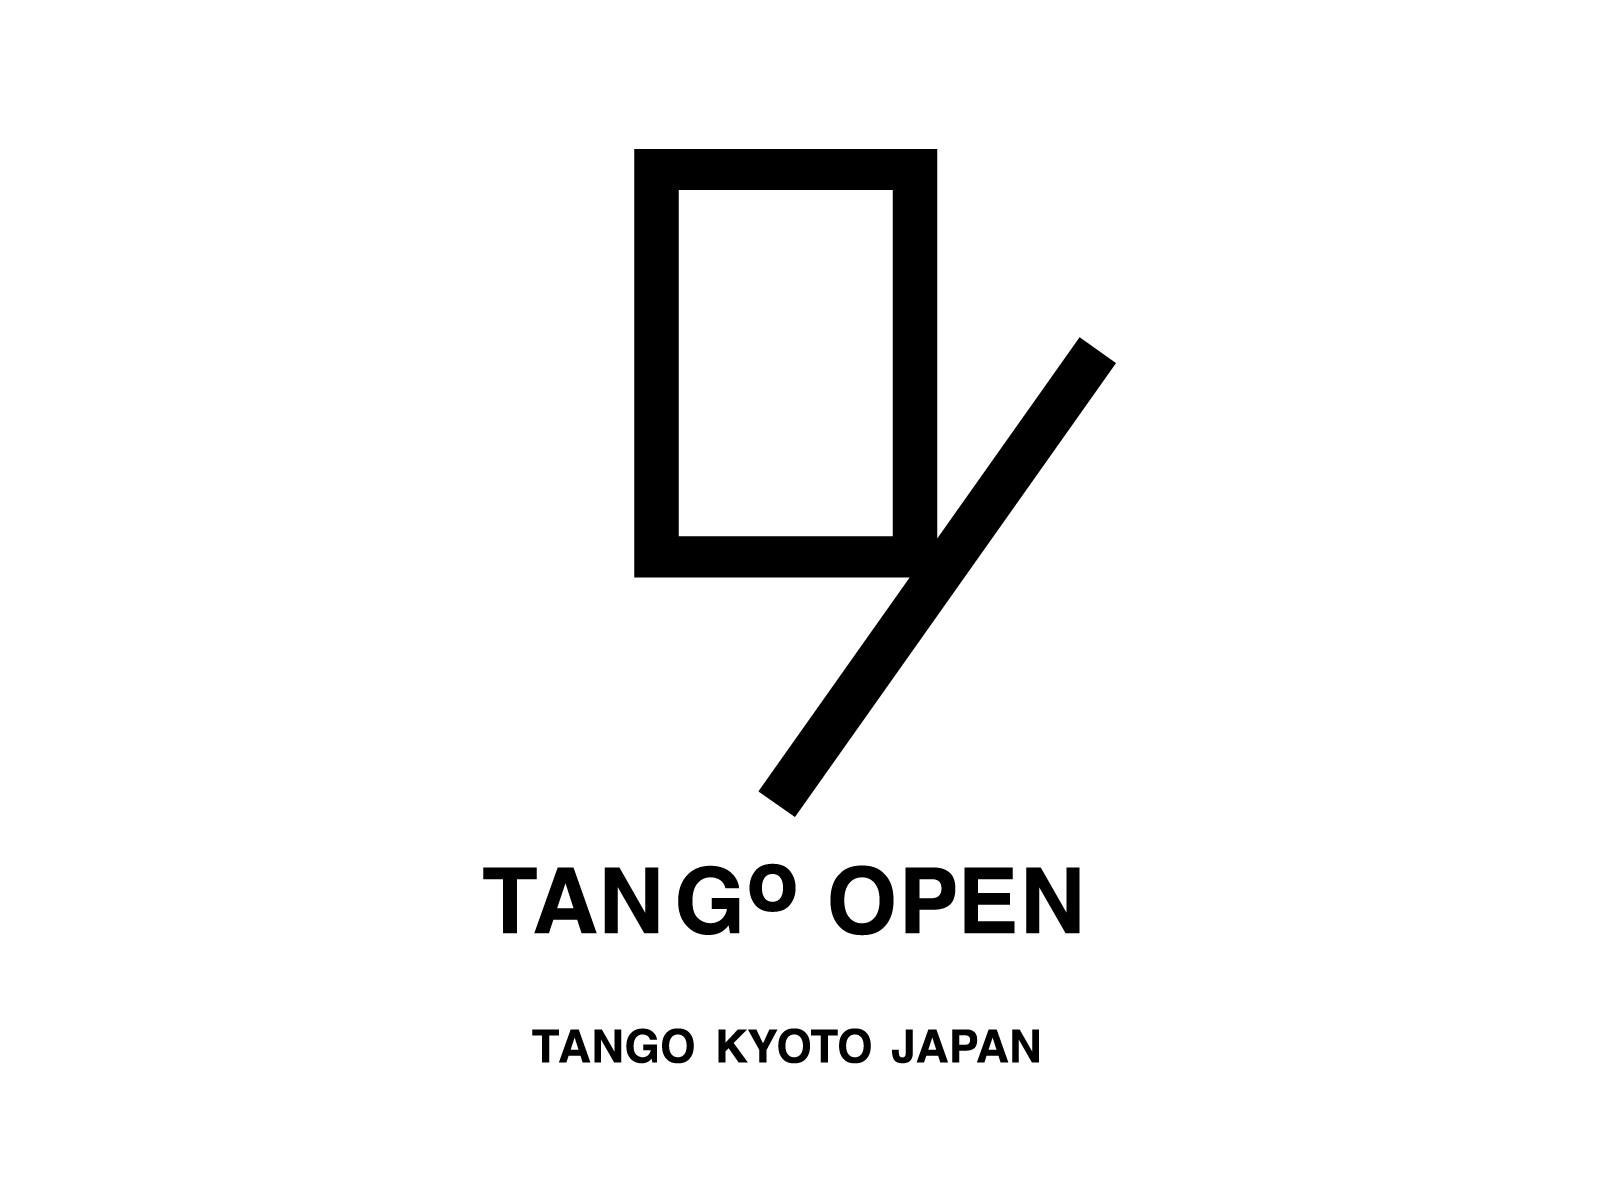 works_tangoopen_logo_01